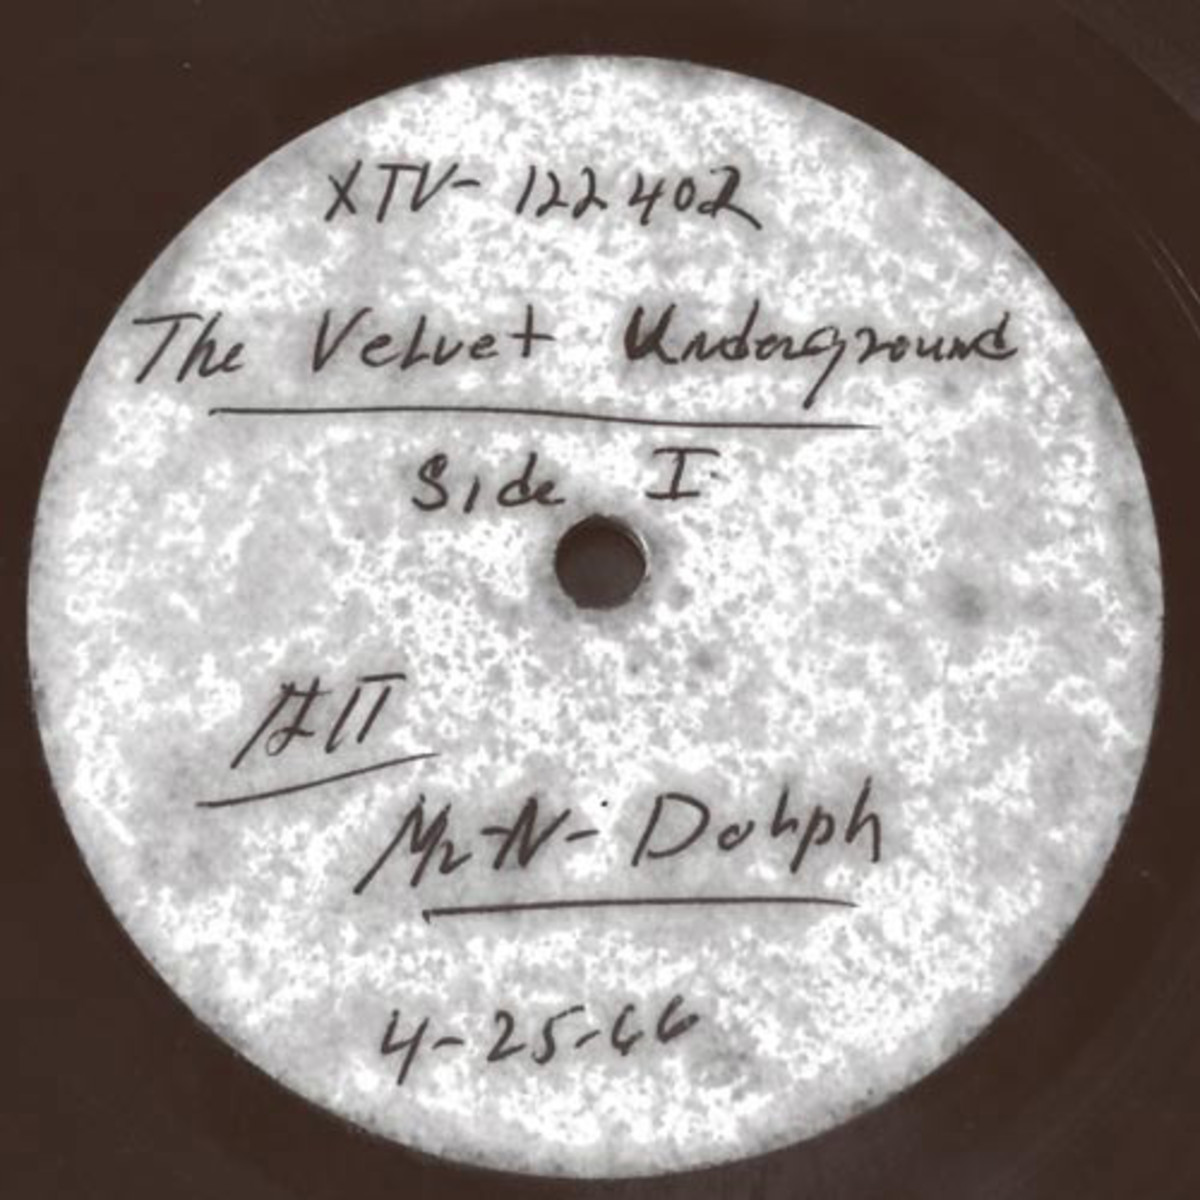 Velvet Underground acetate Shuga Records